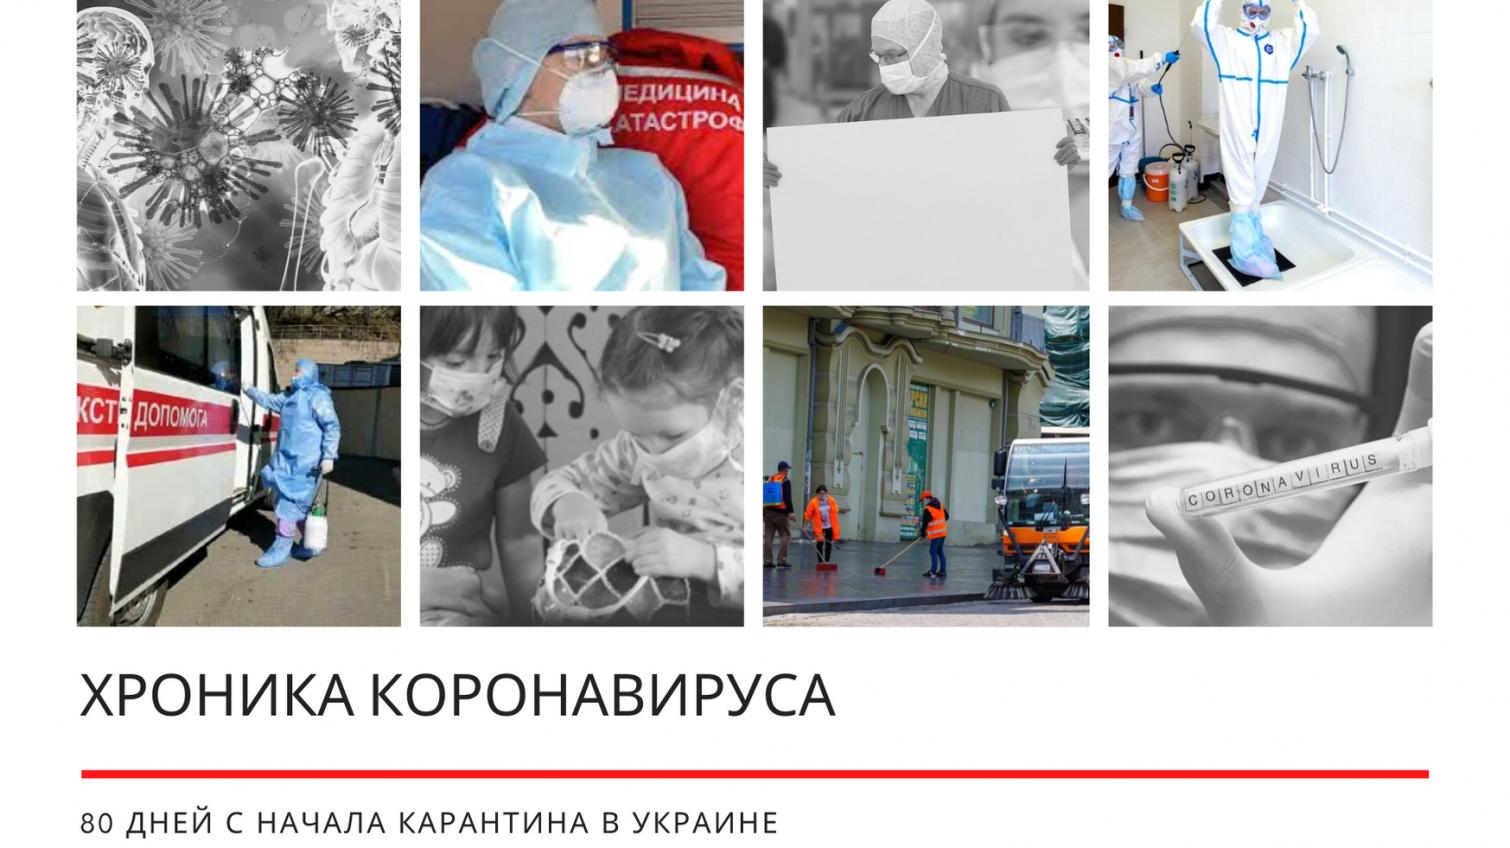 Хроника коронавируса: 80 дней с начала карантина в Украине ОБНОВЛЯЕТСЯ «фото»